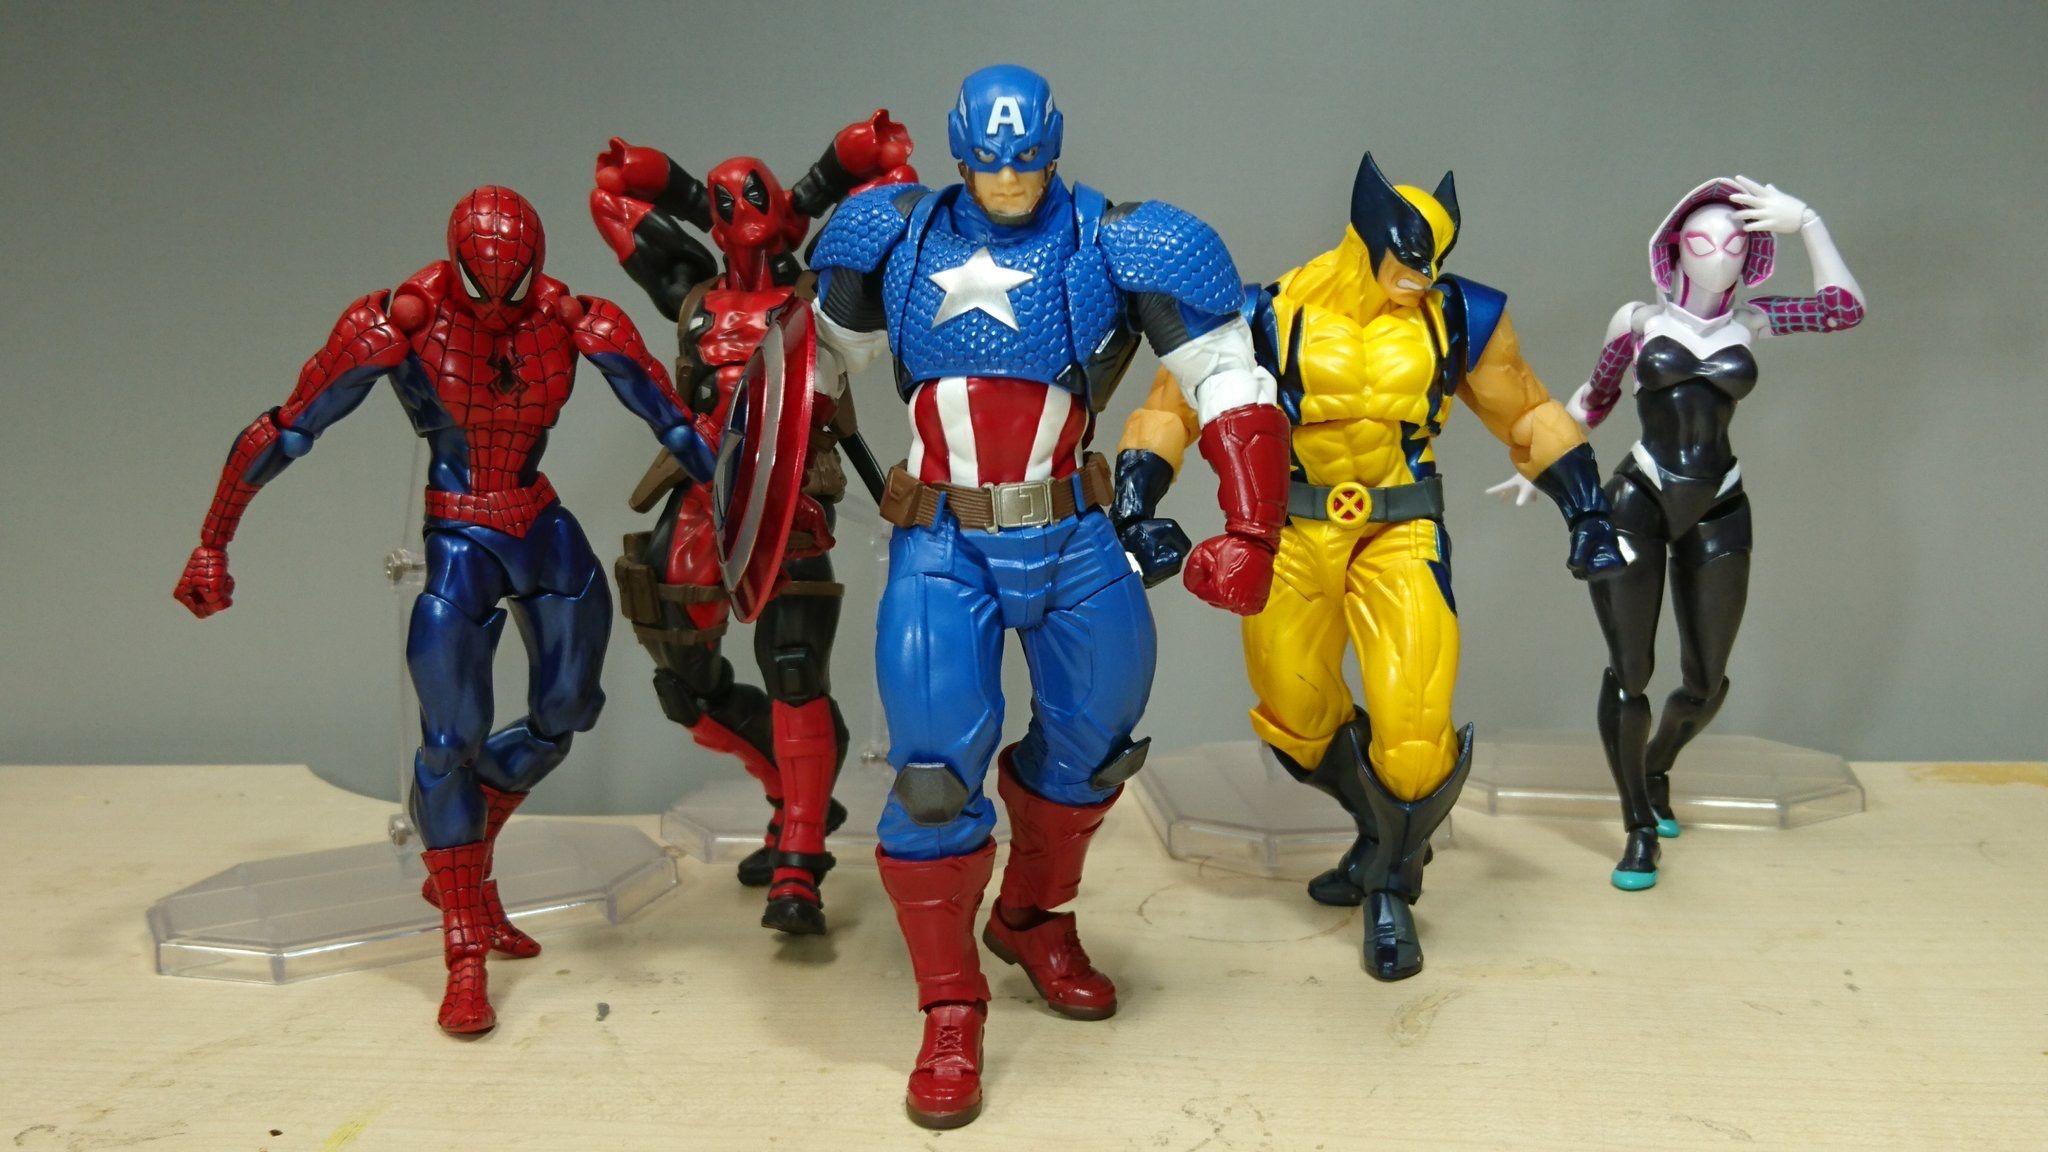 Marvel Legends Vintage Action Figure 16 cm Avengers